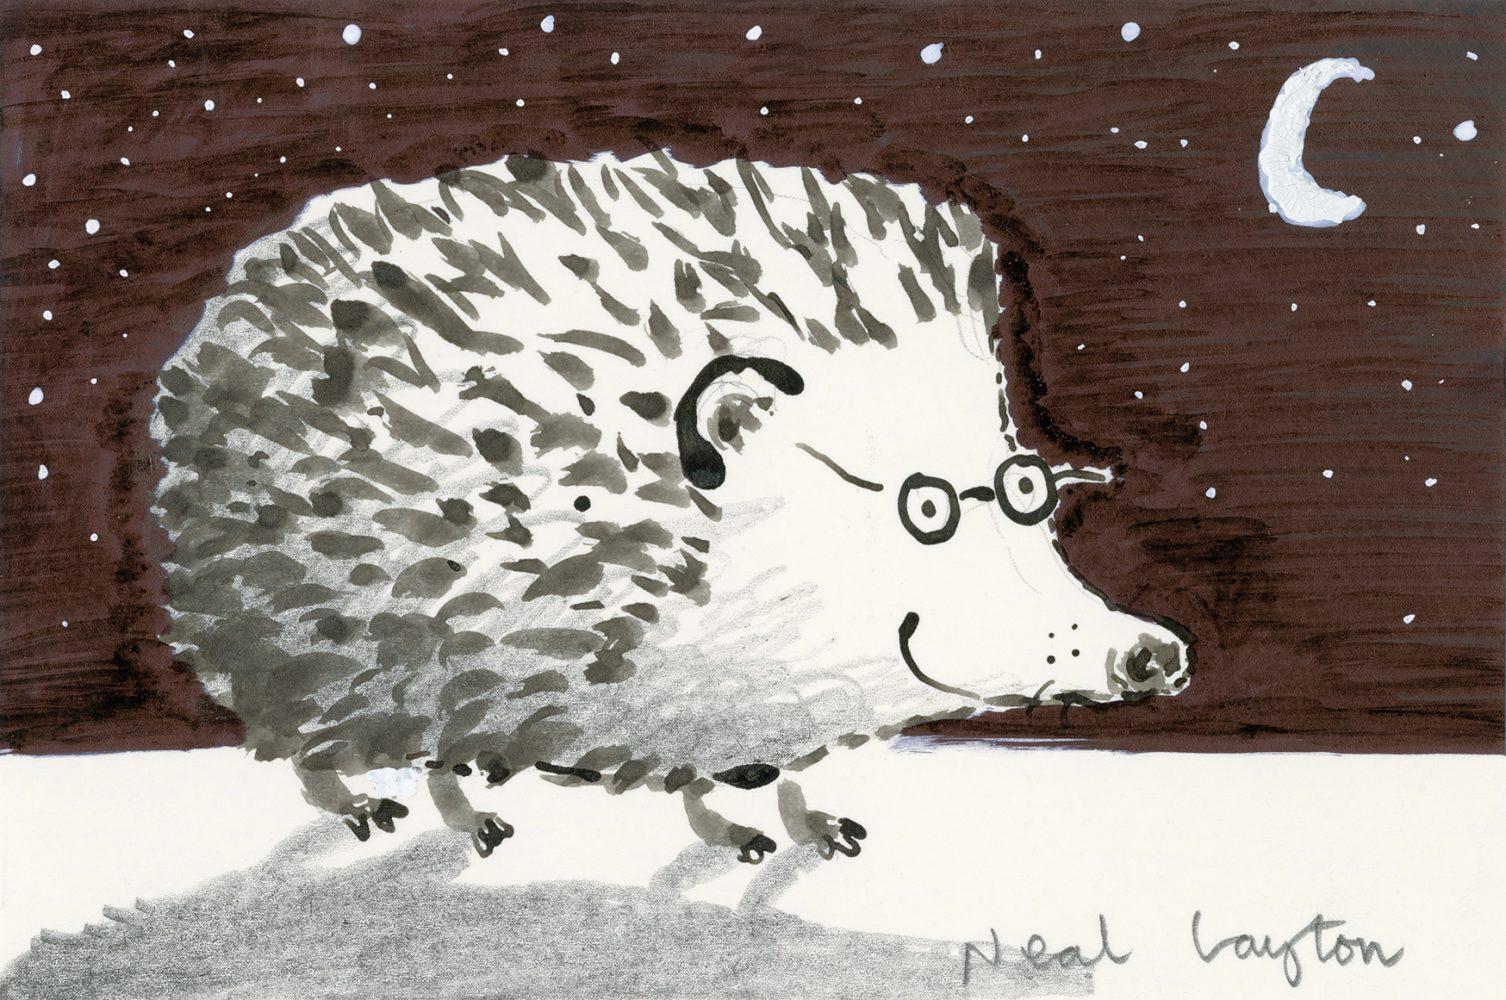 Hedgehog – Neal Layton